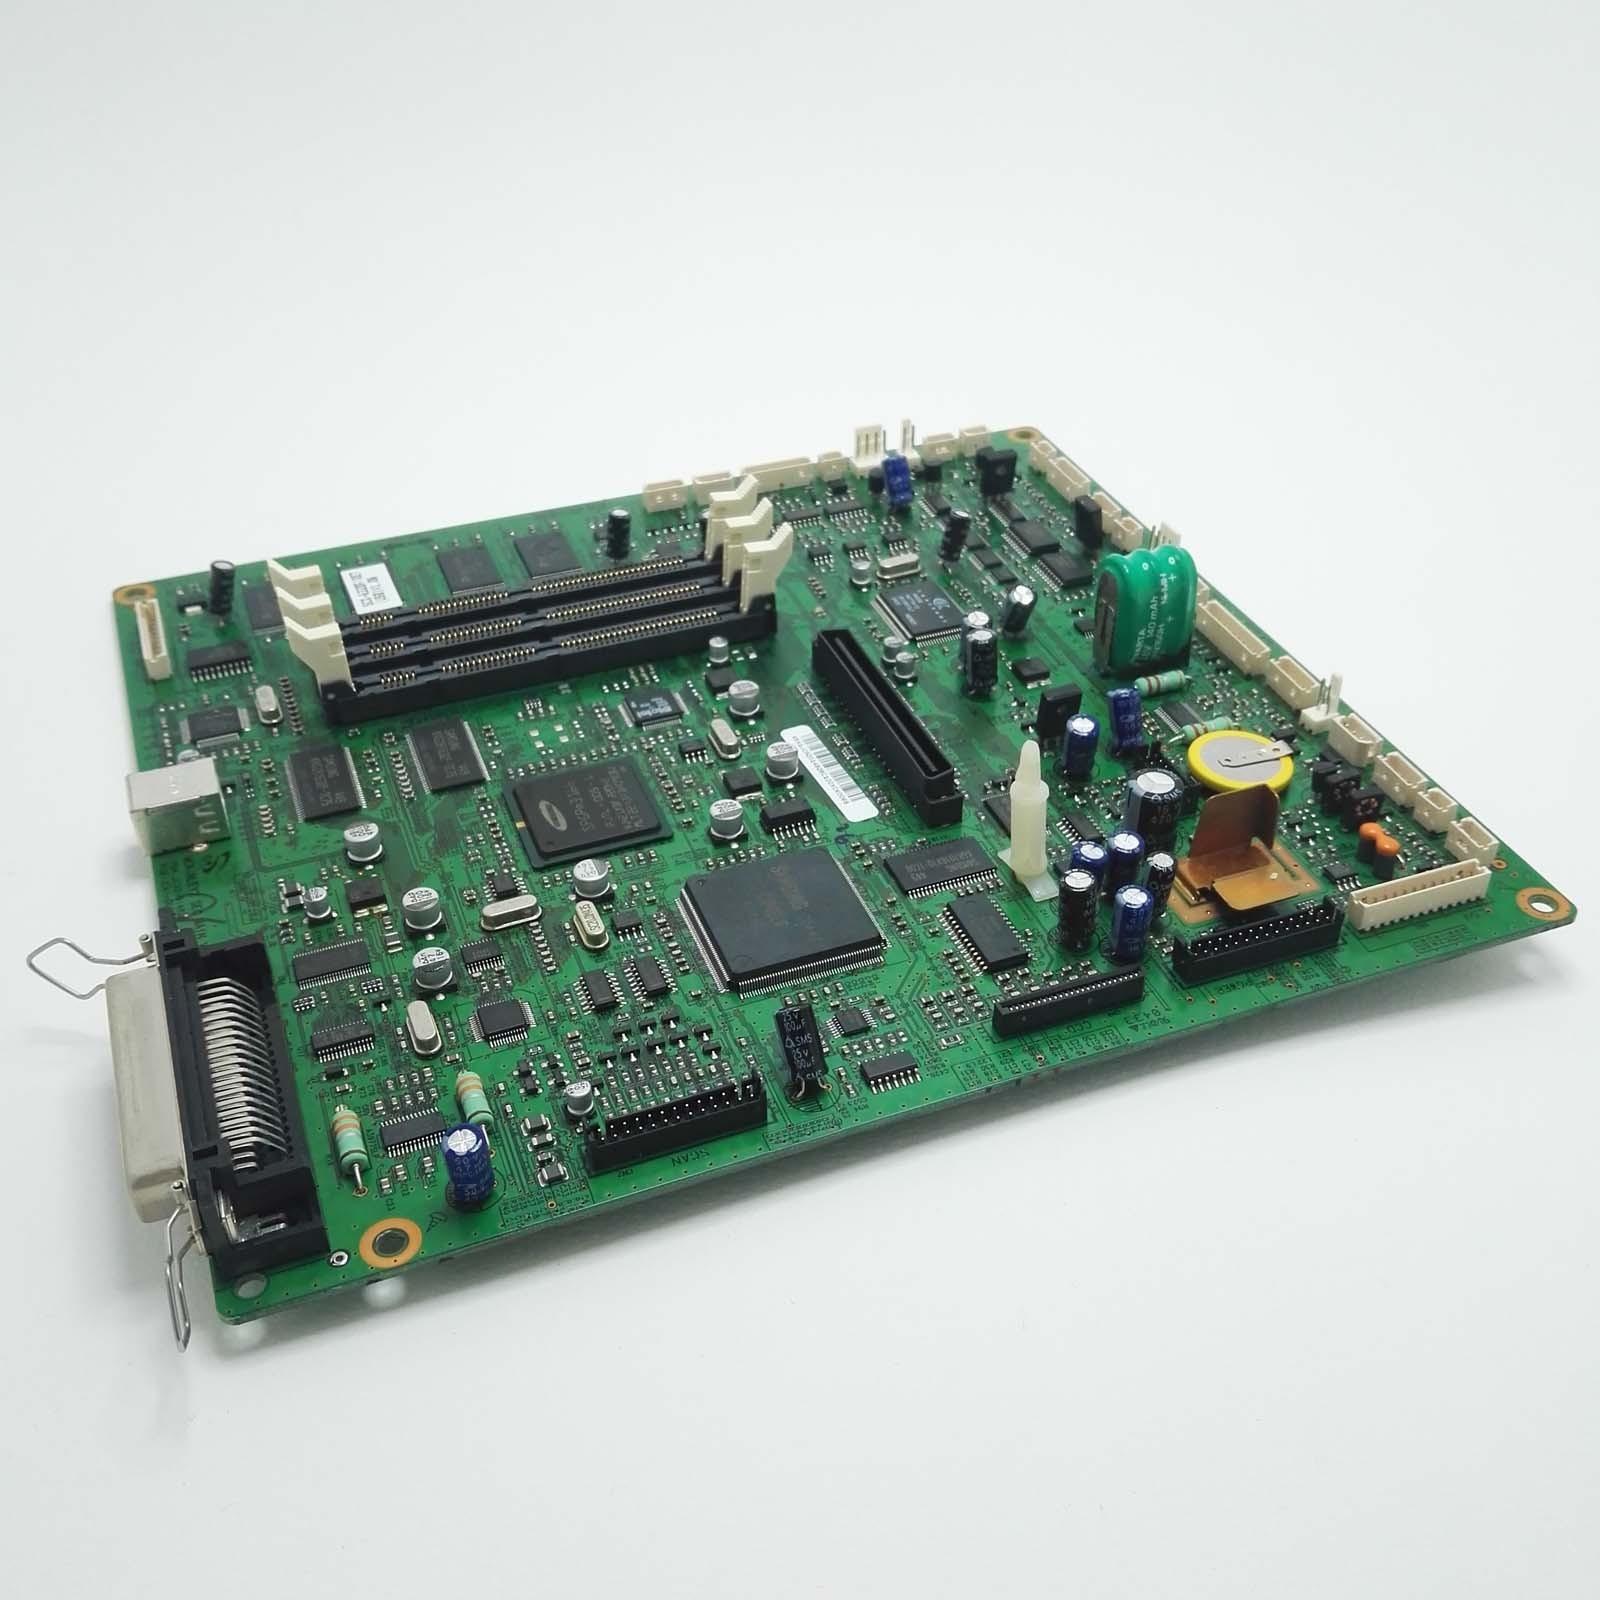 Scheda madre Samsung SCX-6320F MCK INLEY2 SEC MAIN V0.1 Stampante multifunzione